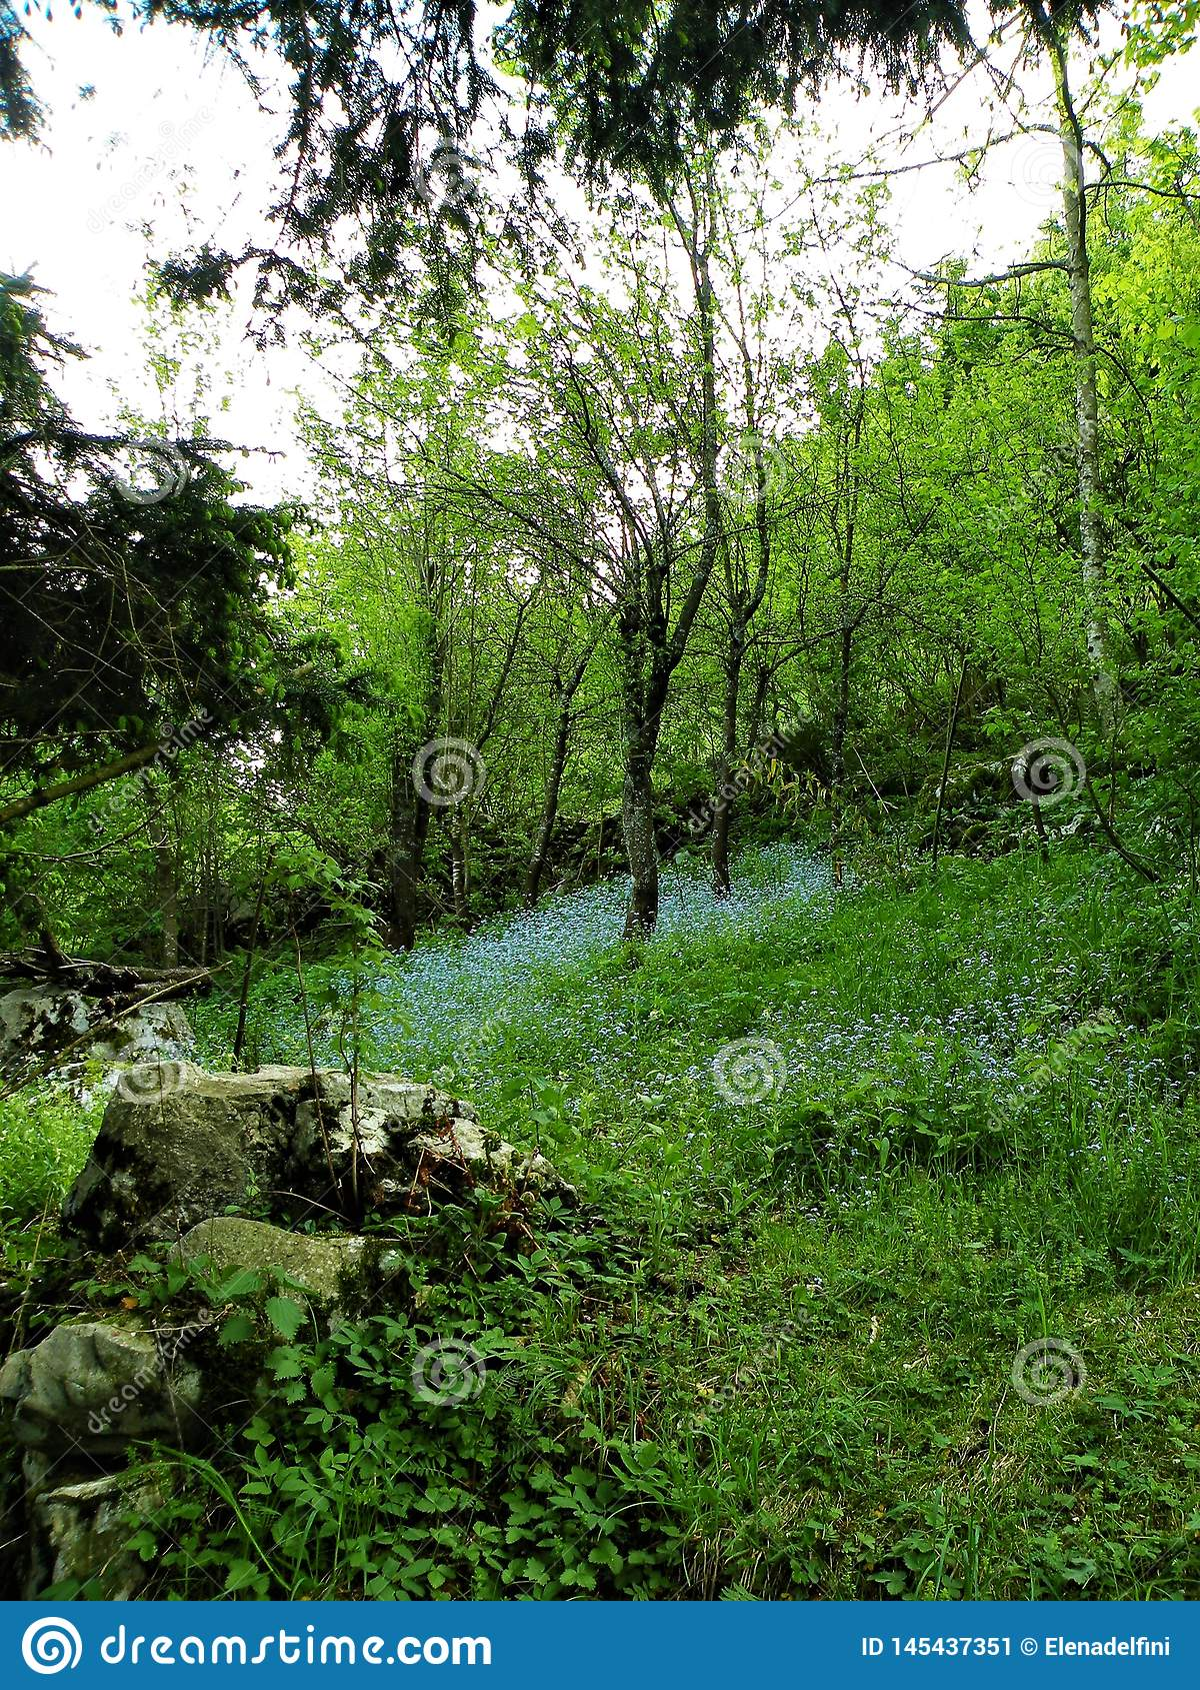 Myosotis no prado verde com rochas